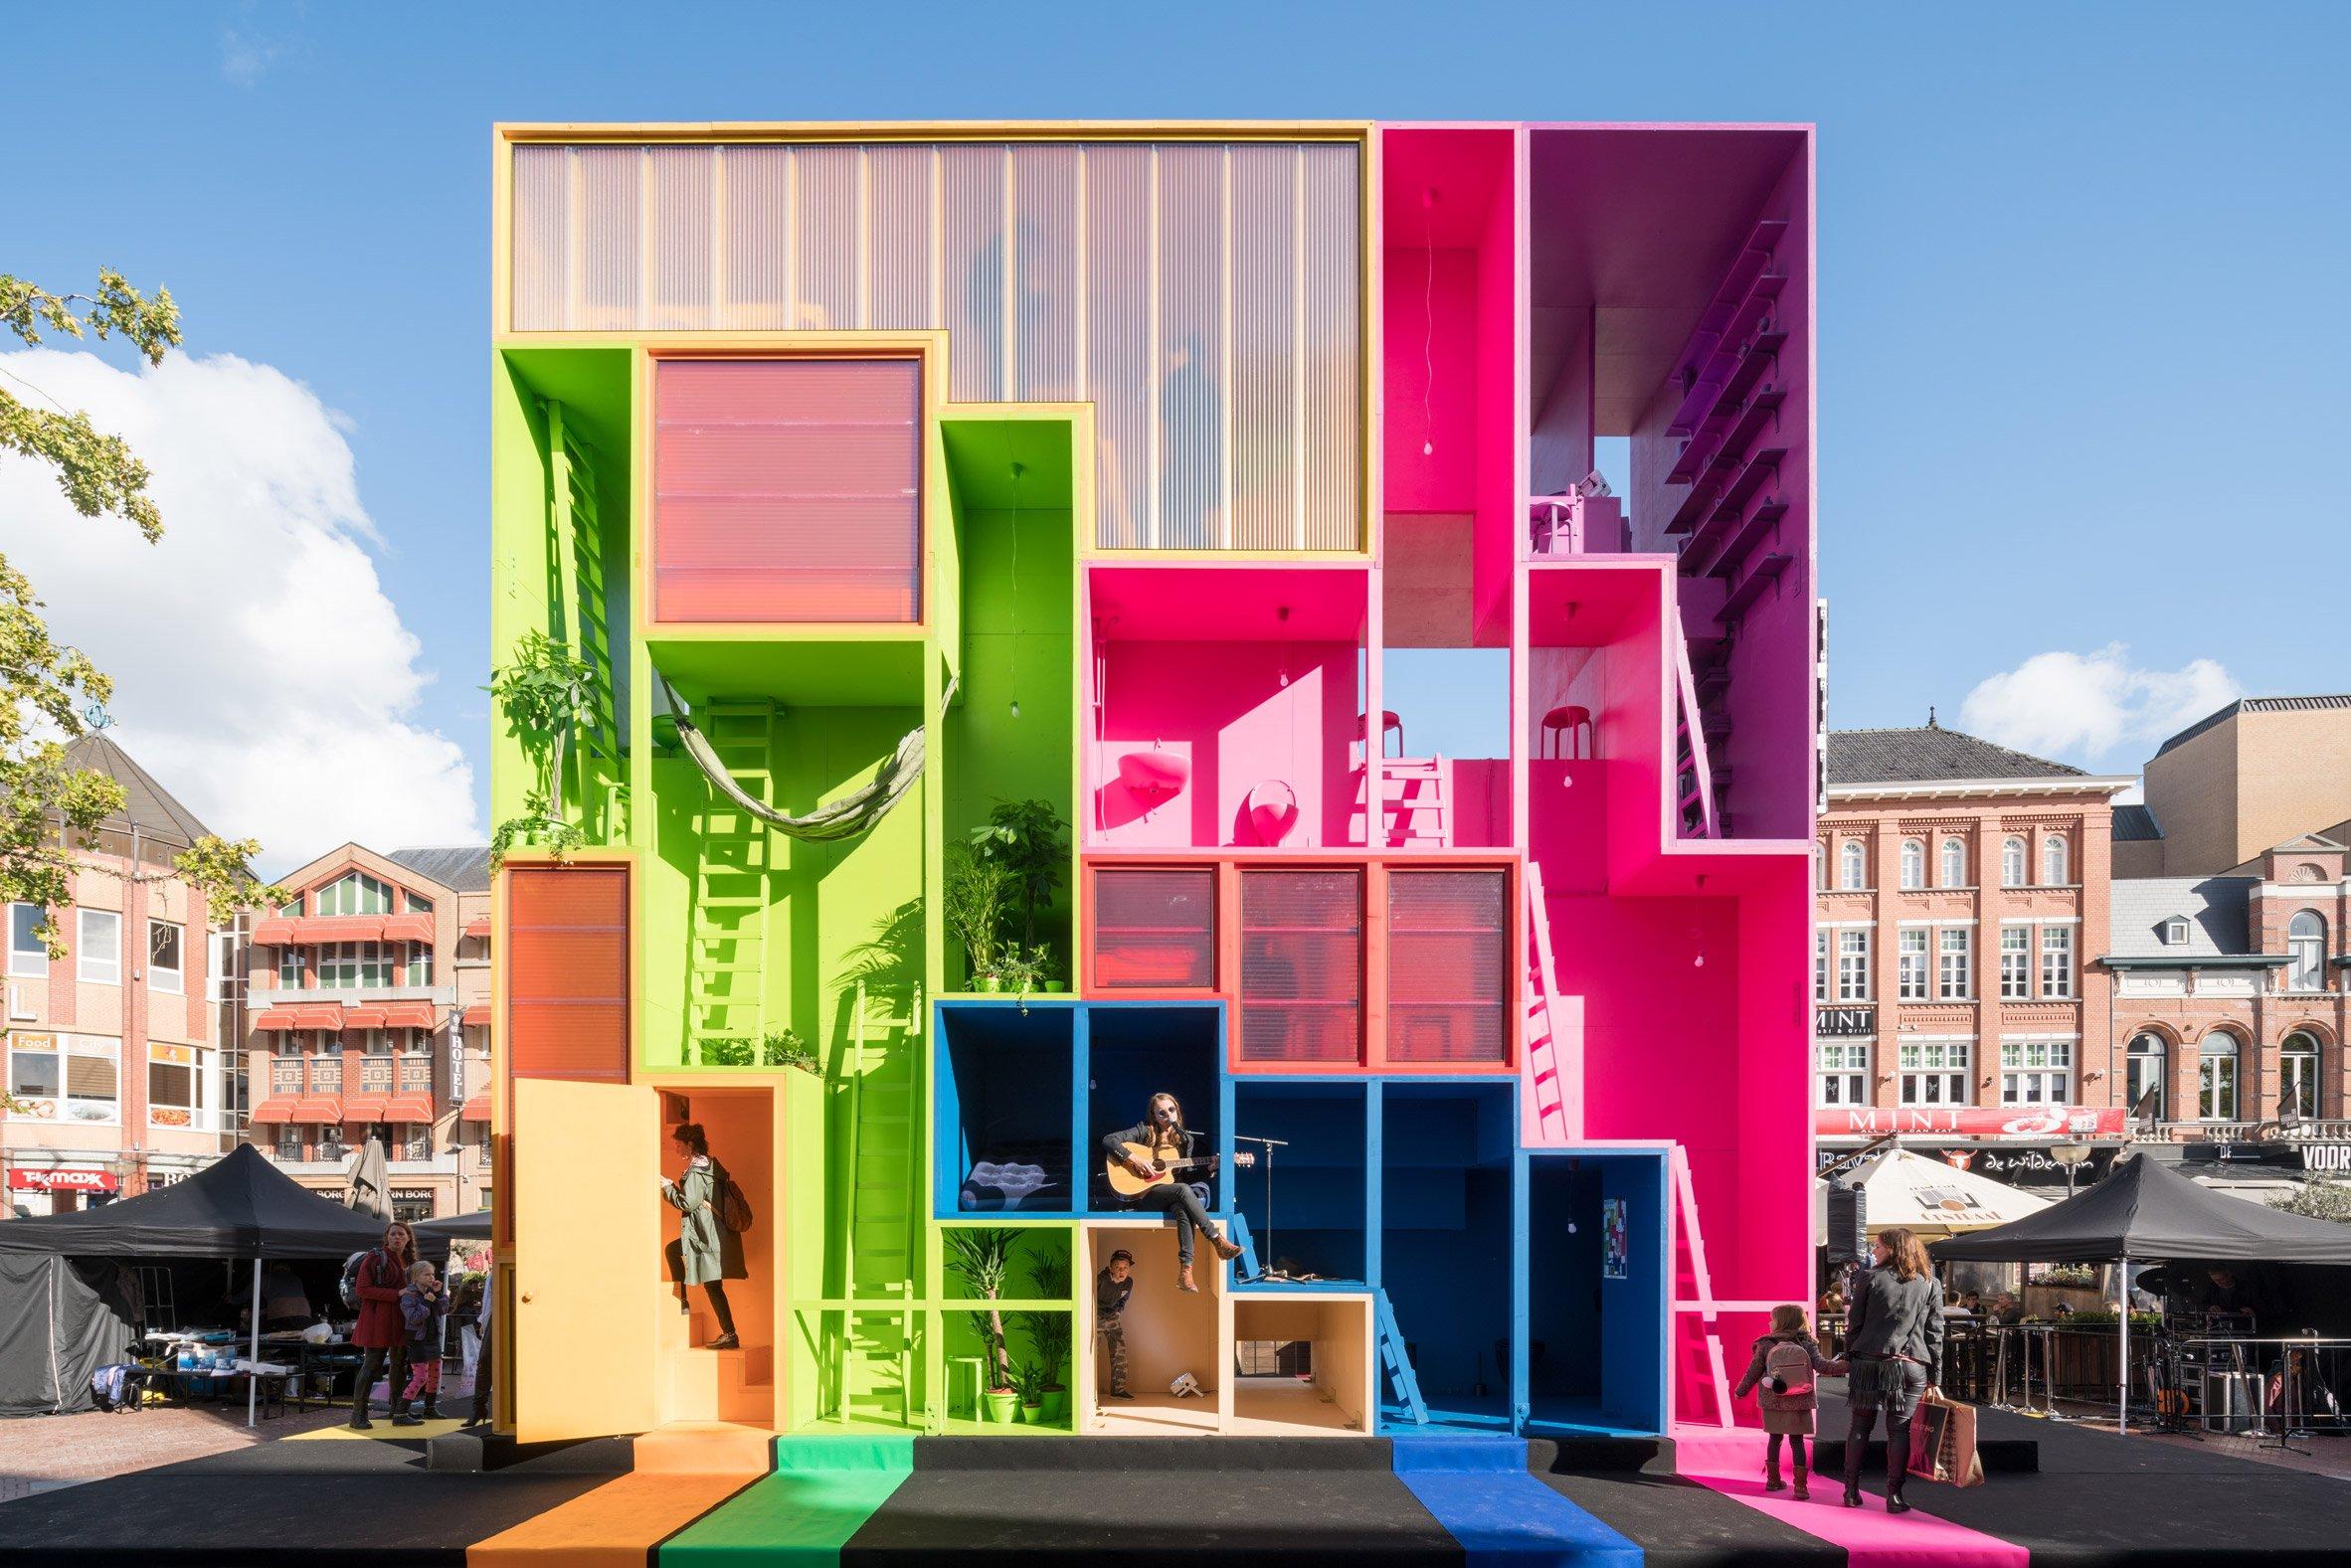 MVRDV presents a house you can reconfigure at Dutch Design Week